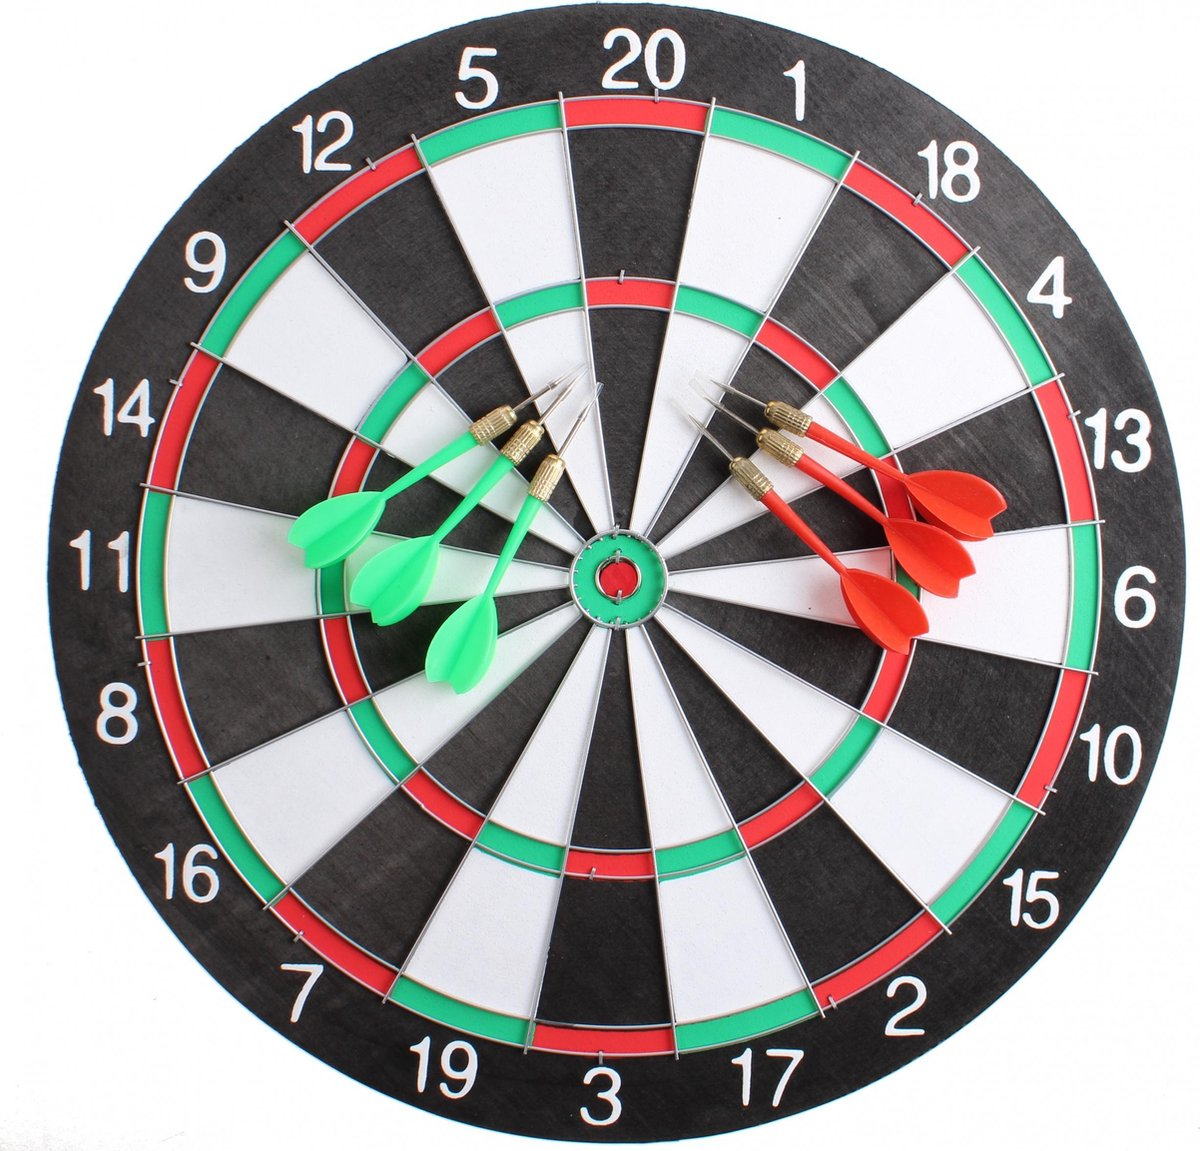 Dartbord - Met 6 Dartpijlen - Dartborden Volwassenen - Dartbord Set - 40,5 cm